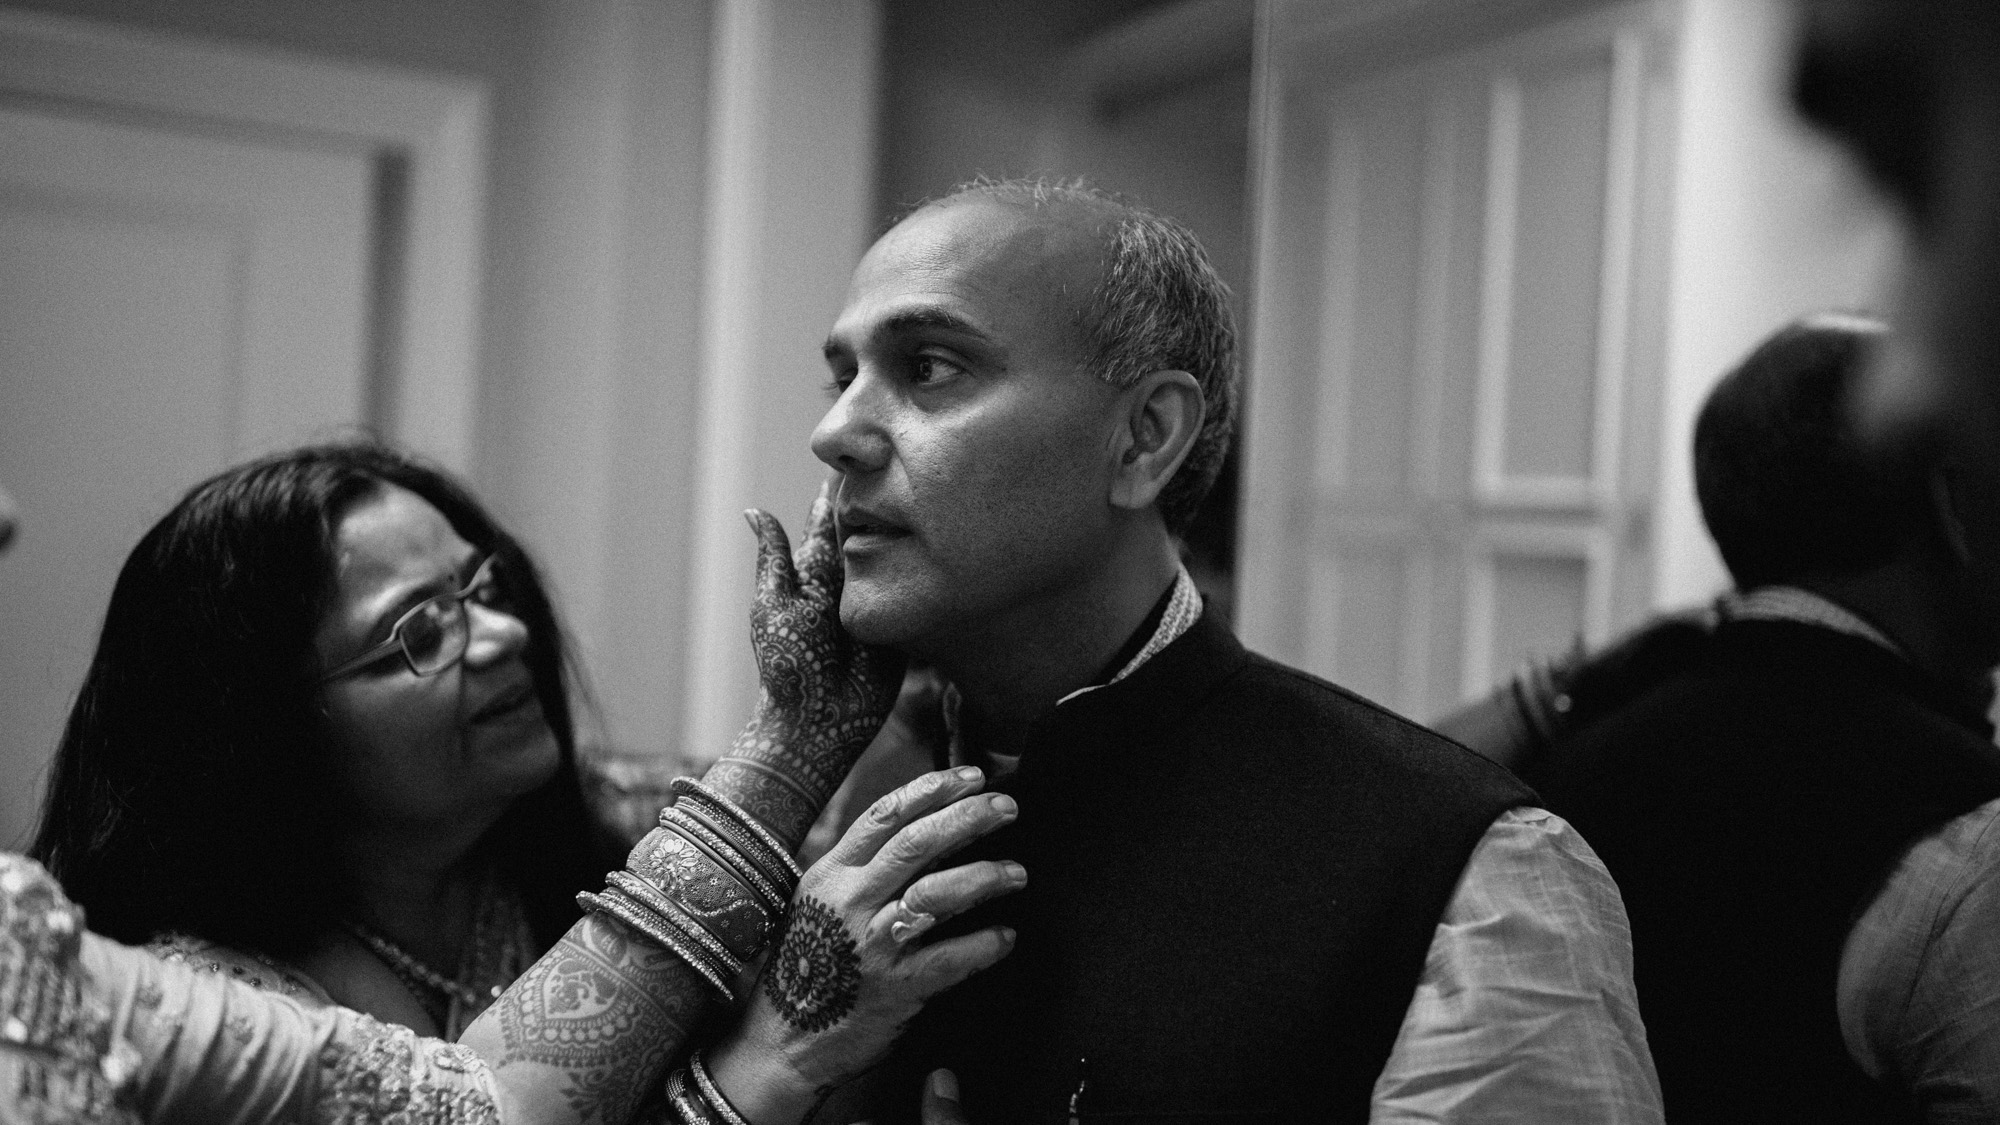 anu_maneesh_alec_vanderboom_Indian_wedding_photography-0015.jpg